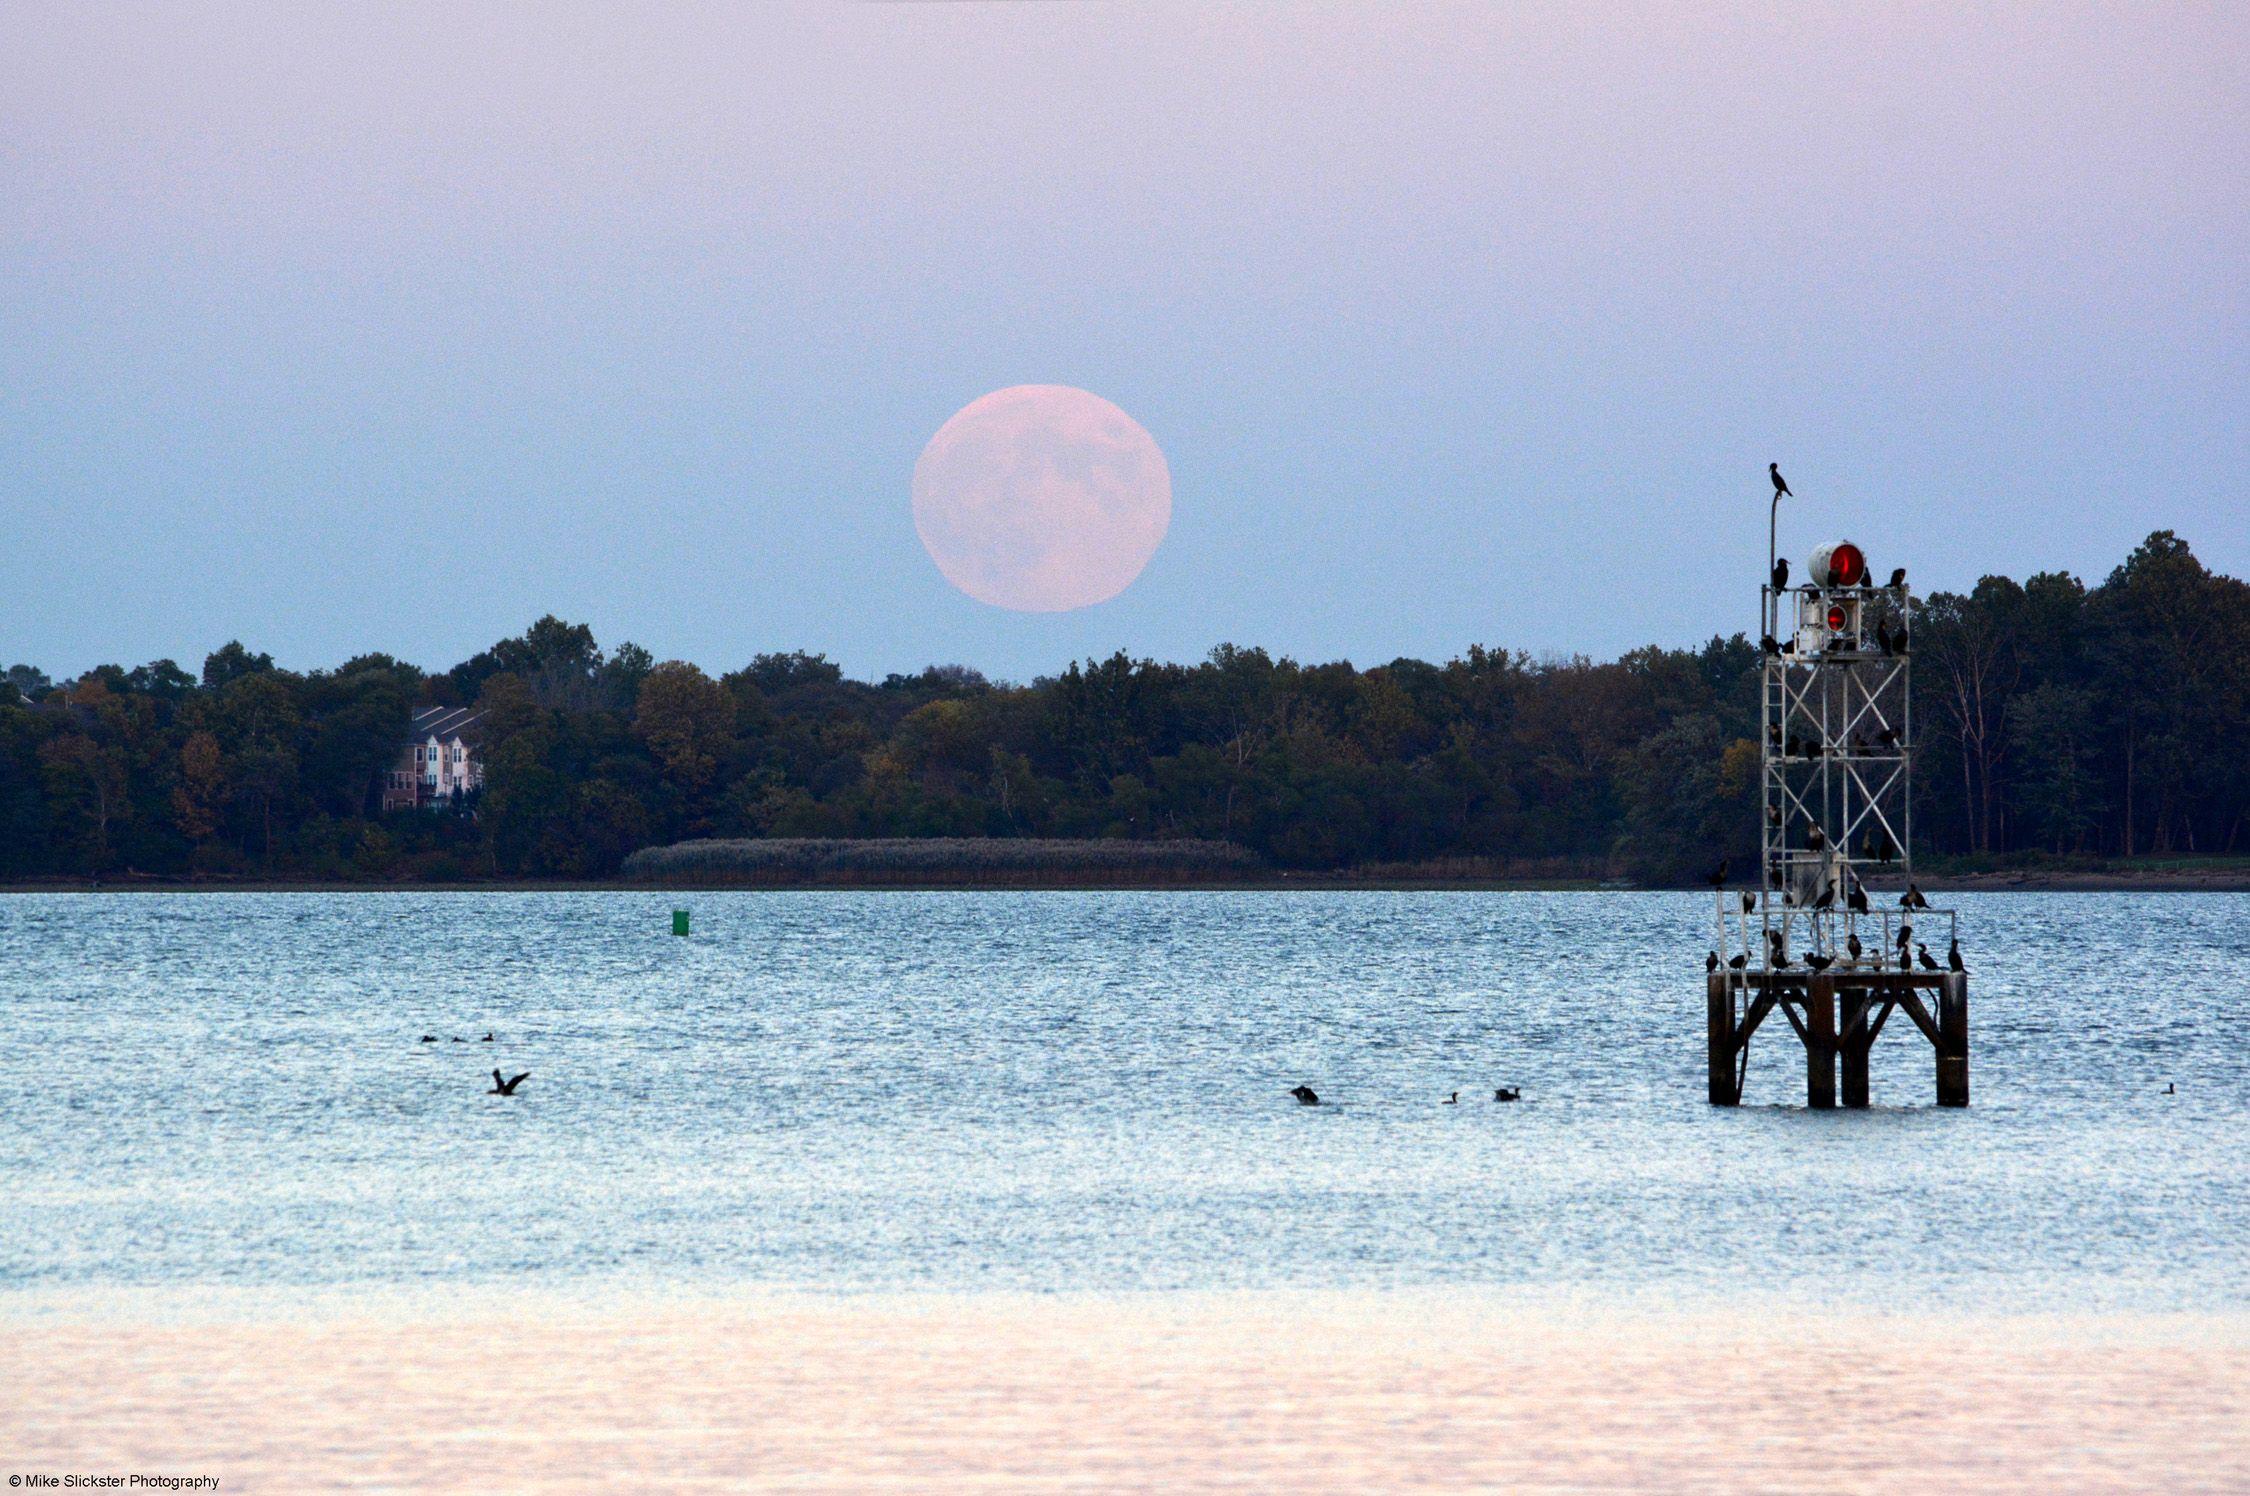 Full Moon on the Rise Over Delaware River